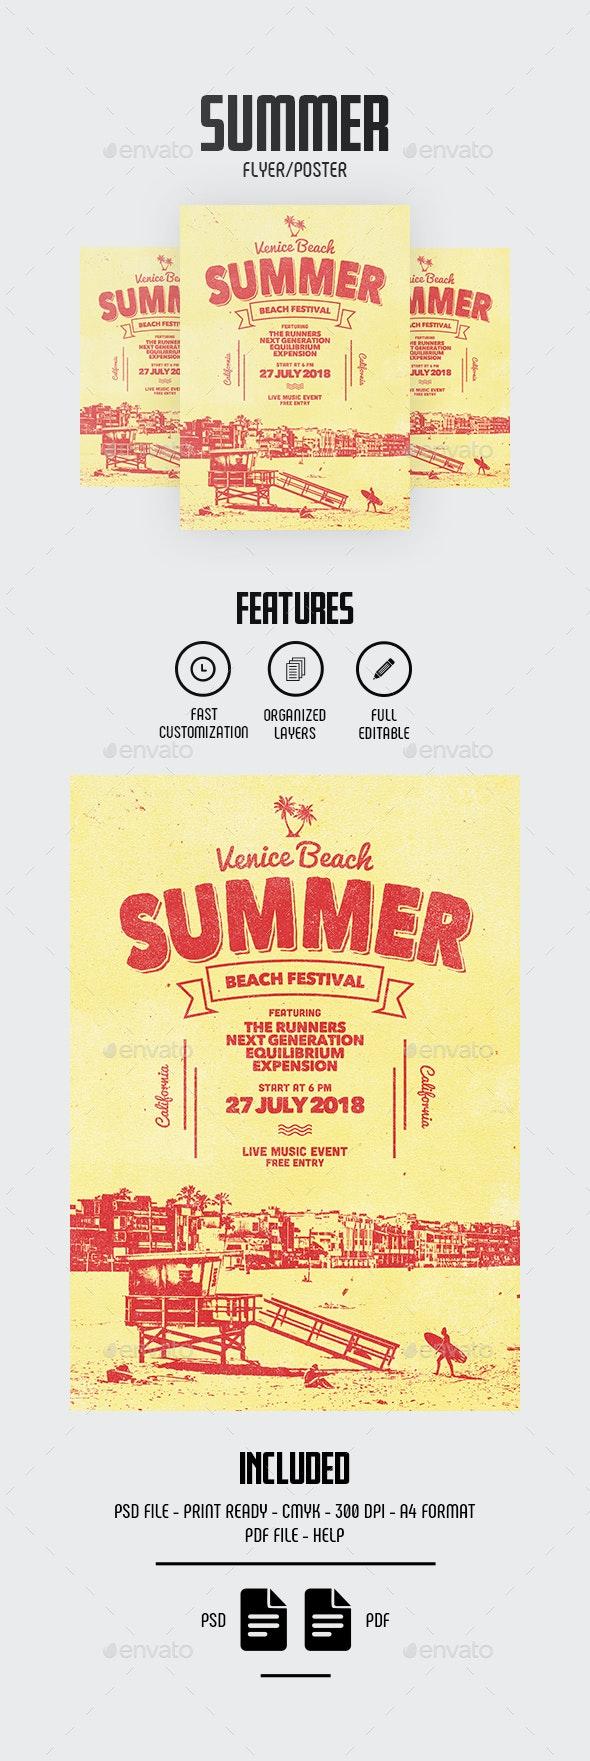 Summer Flyer/Poster - Concerts Events